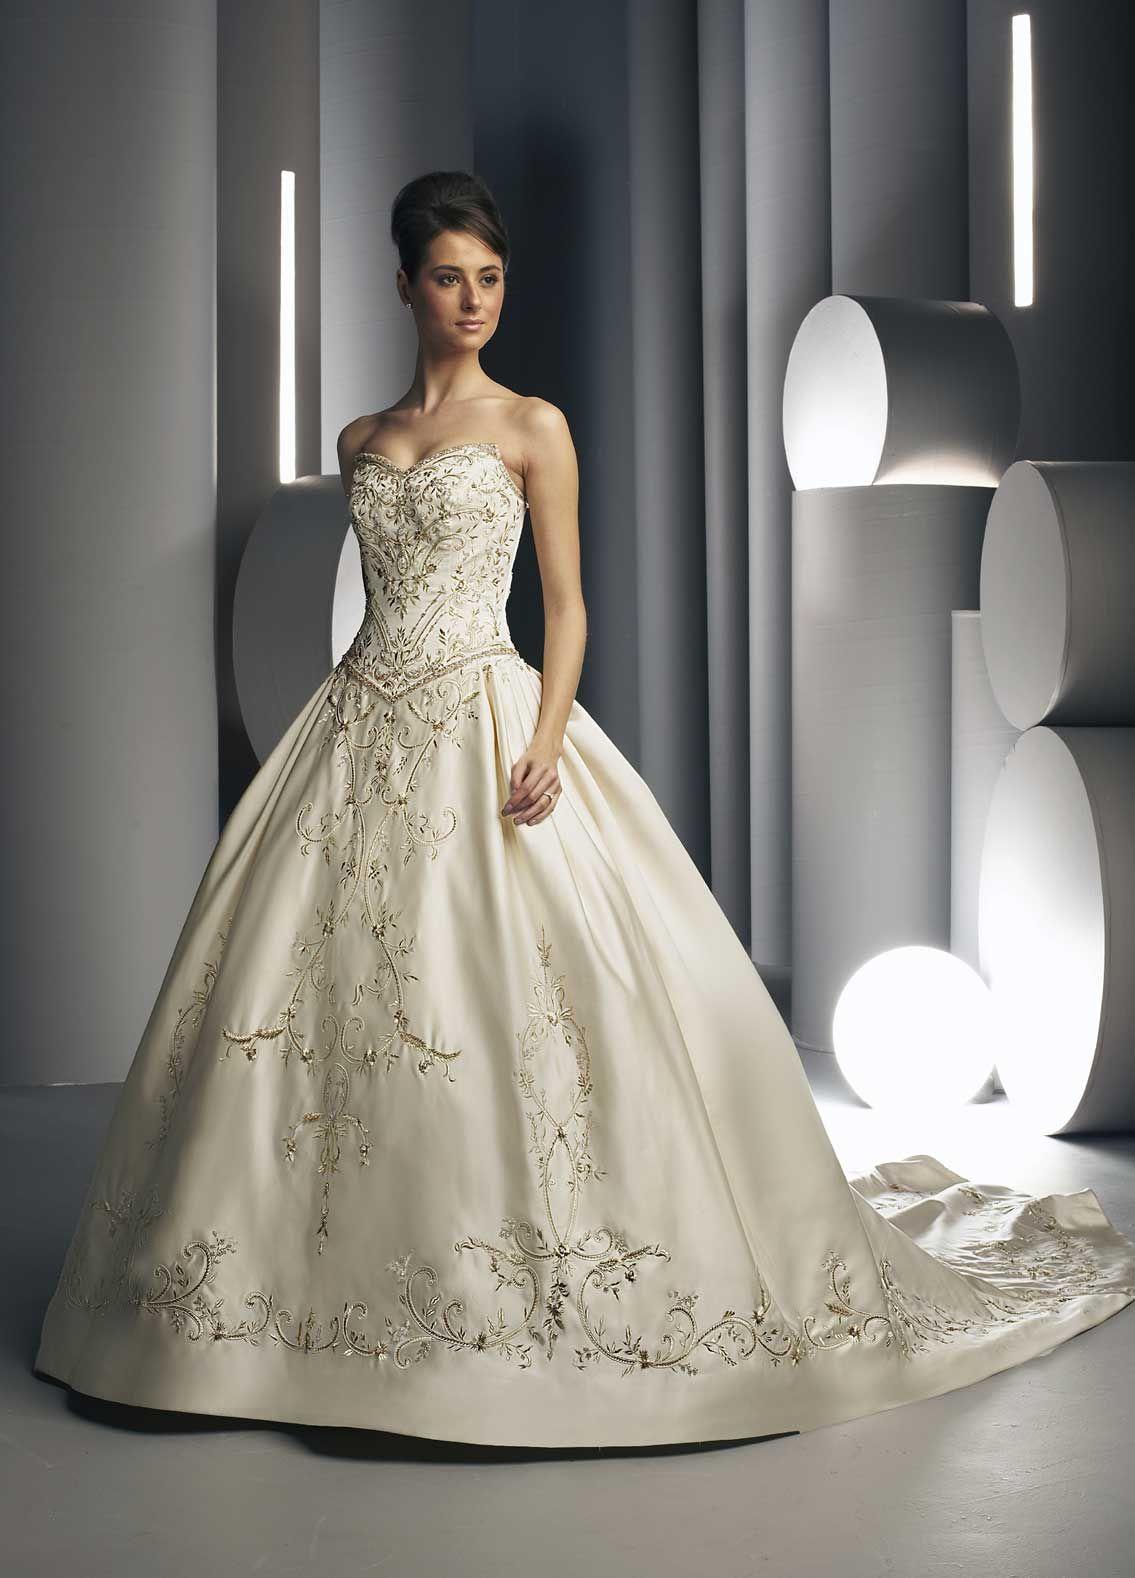 white wedding dress wedding dresses wedding dresses off white wedding dresses